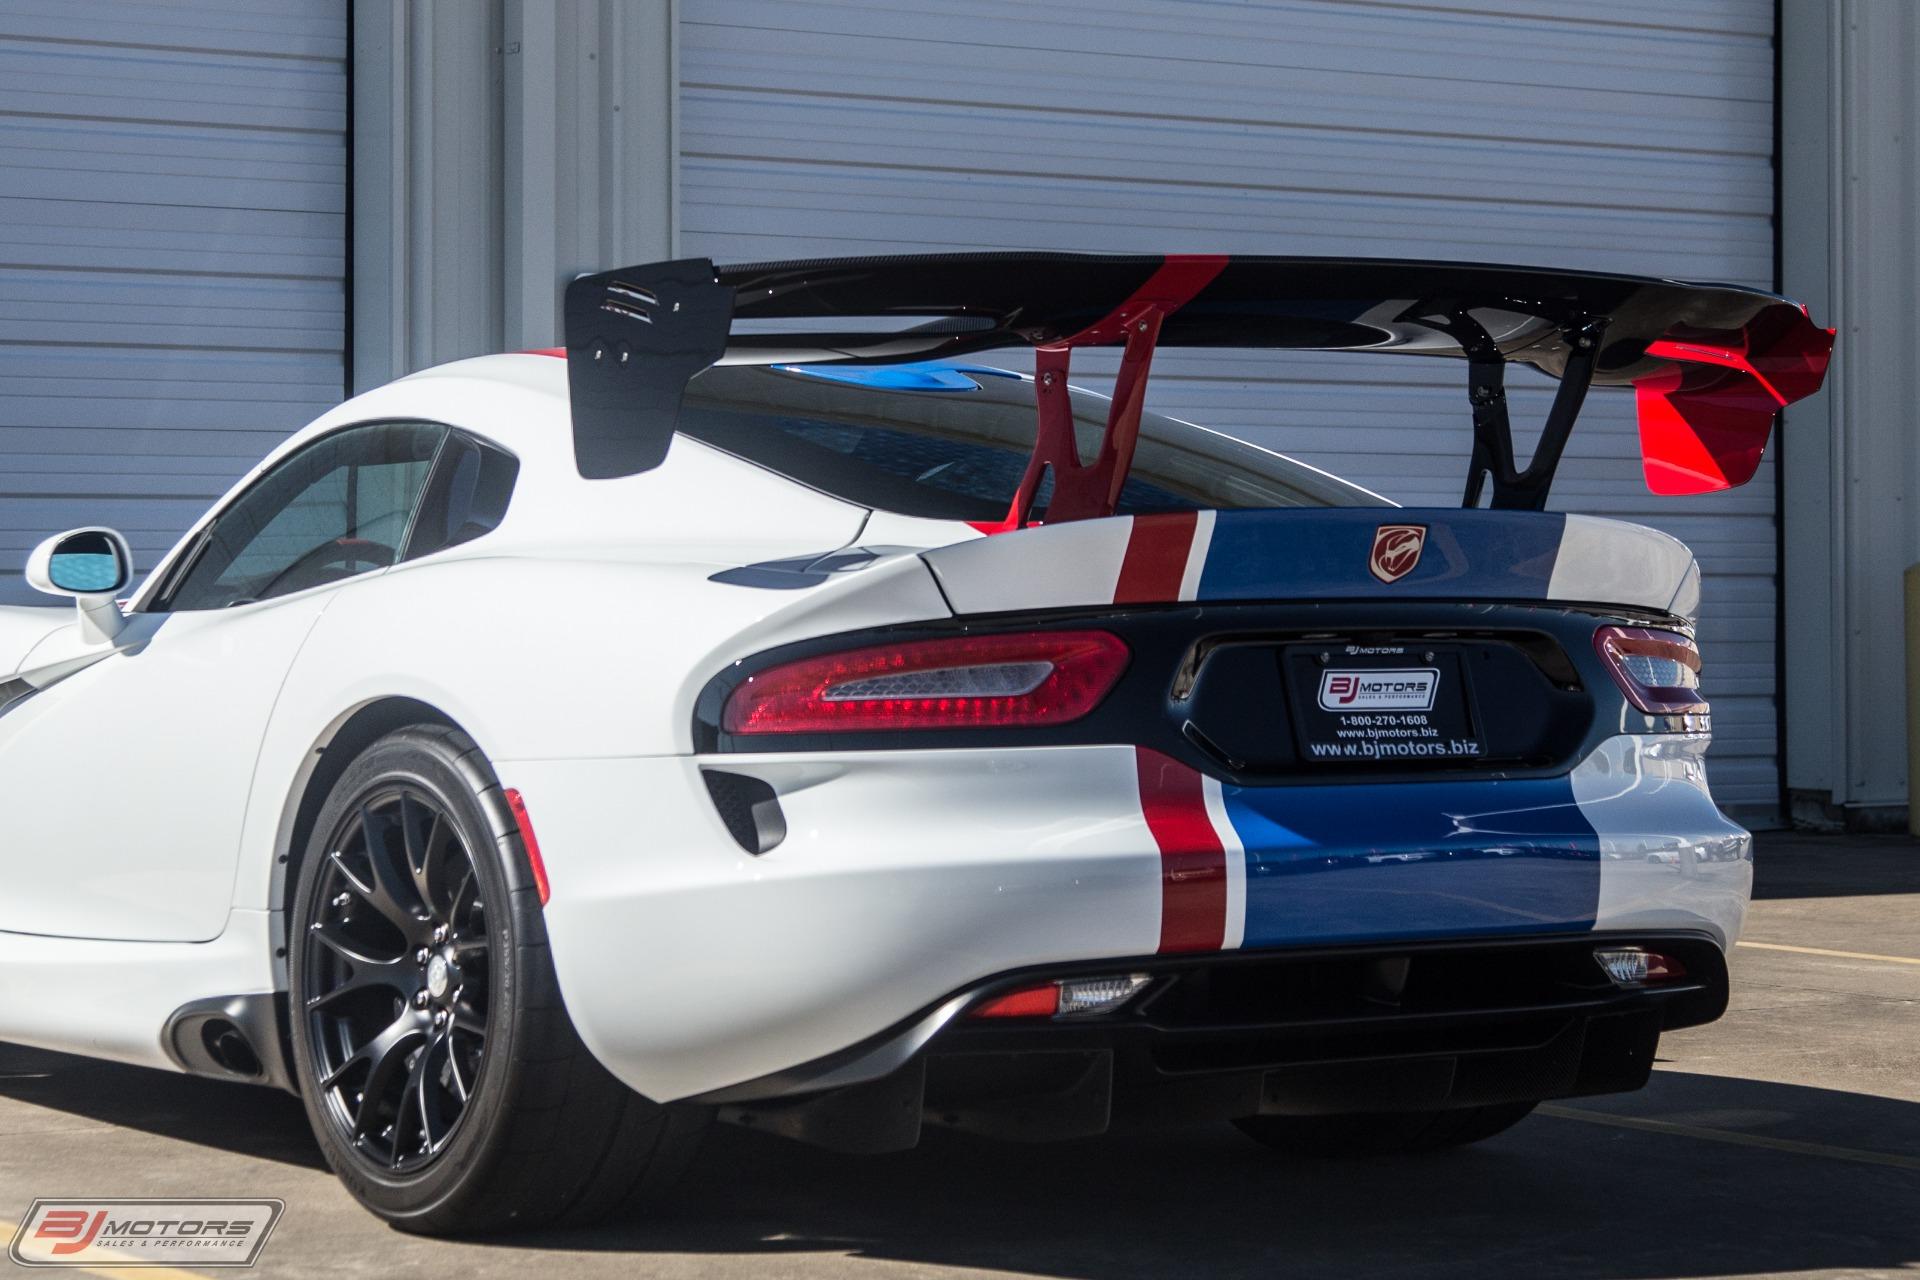 New-2017-Dodge-Viper-GTC-Dealer-Edition--10-of-11